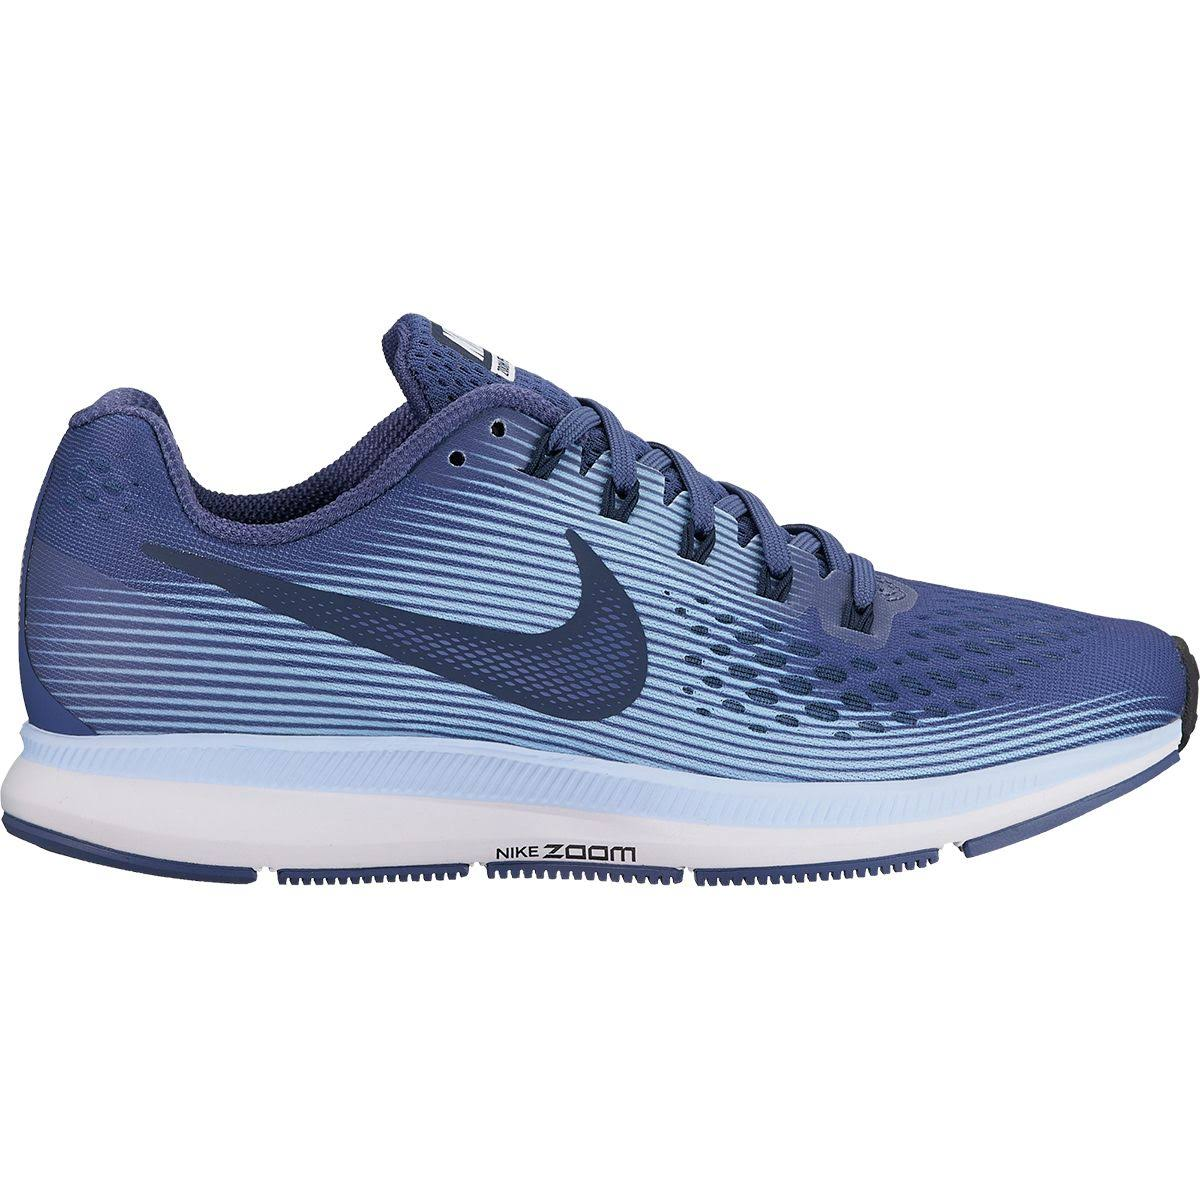 Women's Running 6 Kelly's Blue light Zoom Air Warehouse B 5 34 Blue From Pegasus Nike rwoSROaqr